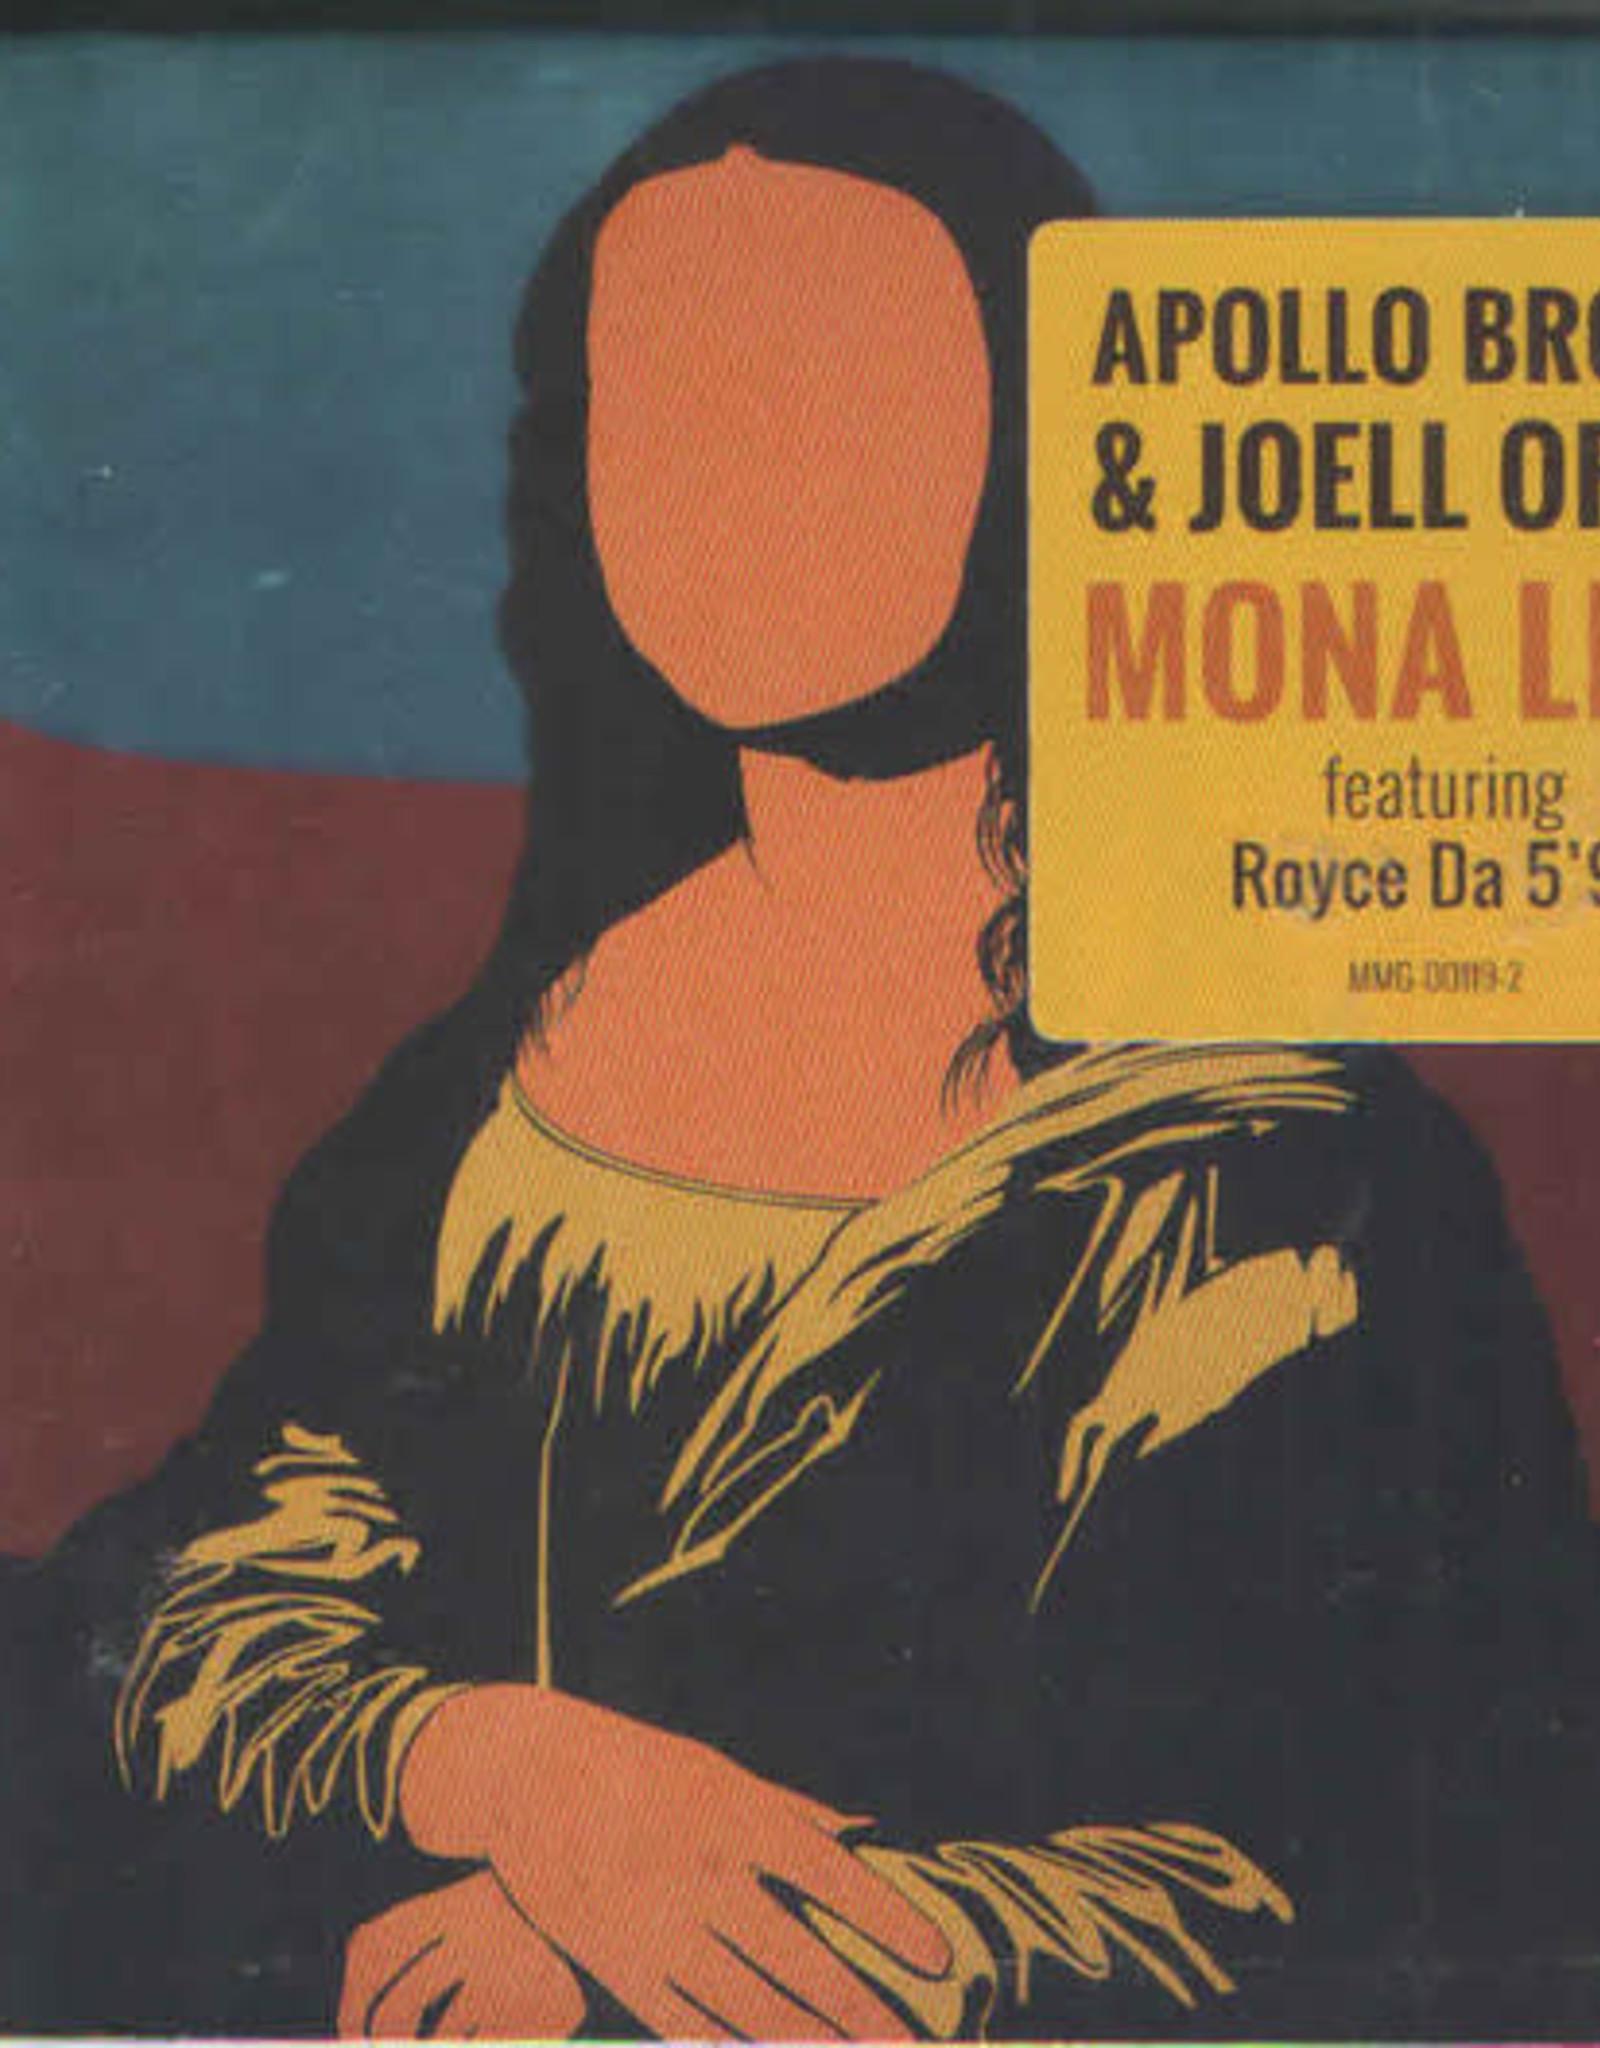 Apollo Brown & Joell Ortiz  - Mona Lisa